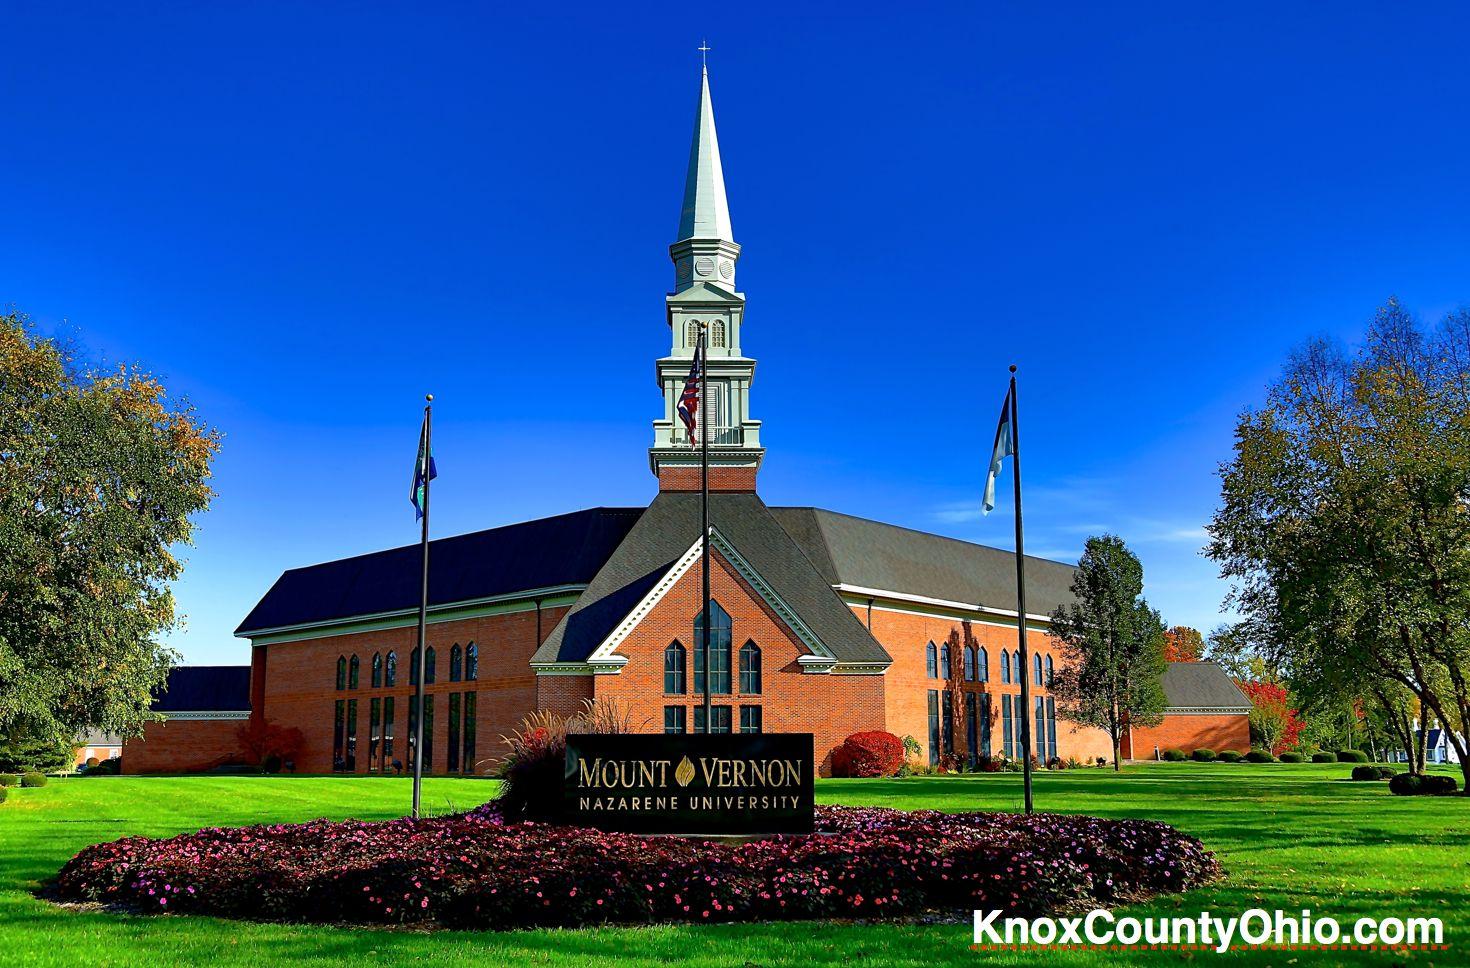 Mount Vernon Nazarene University >> Mount Vernon Nazarene University Chapel Photo By Sam Miller